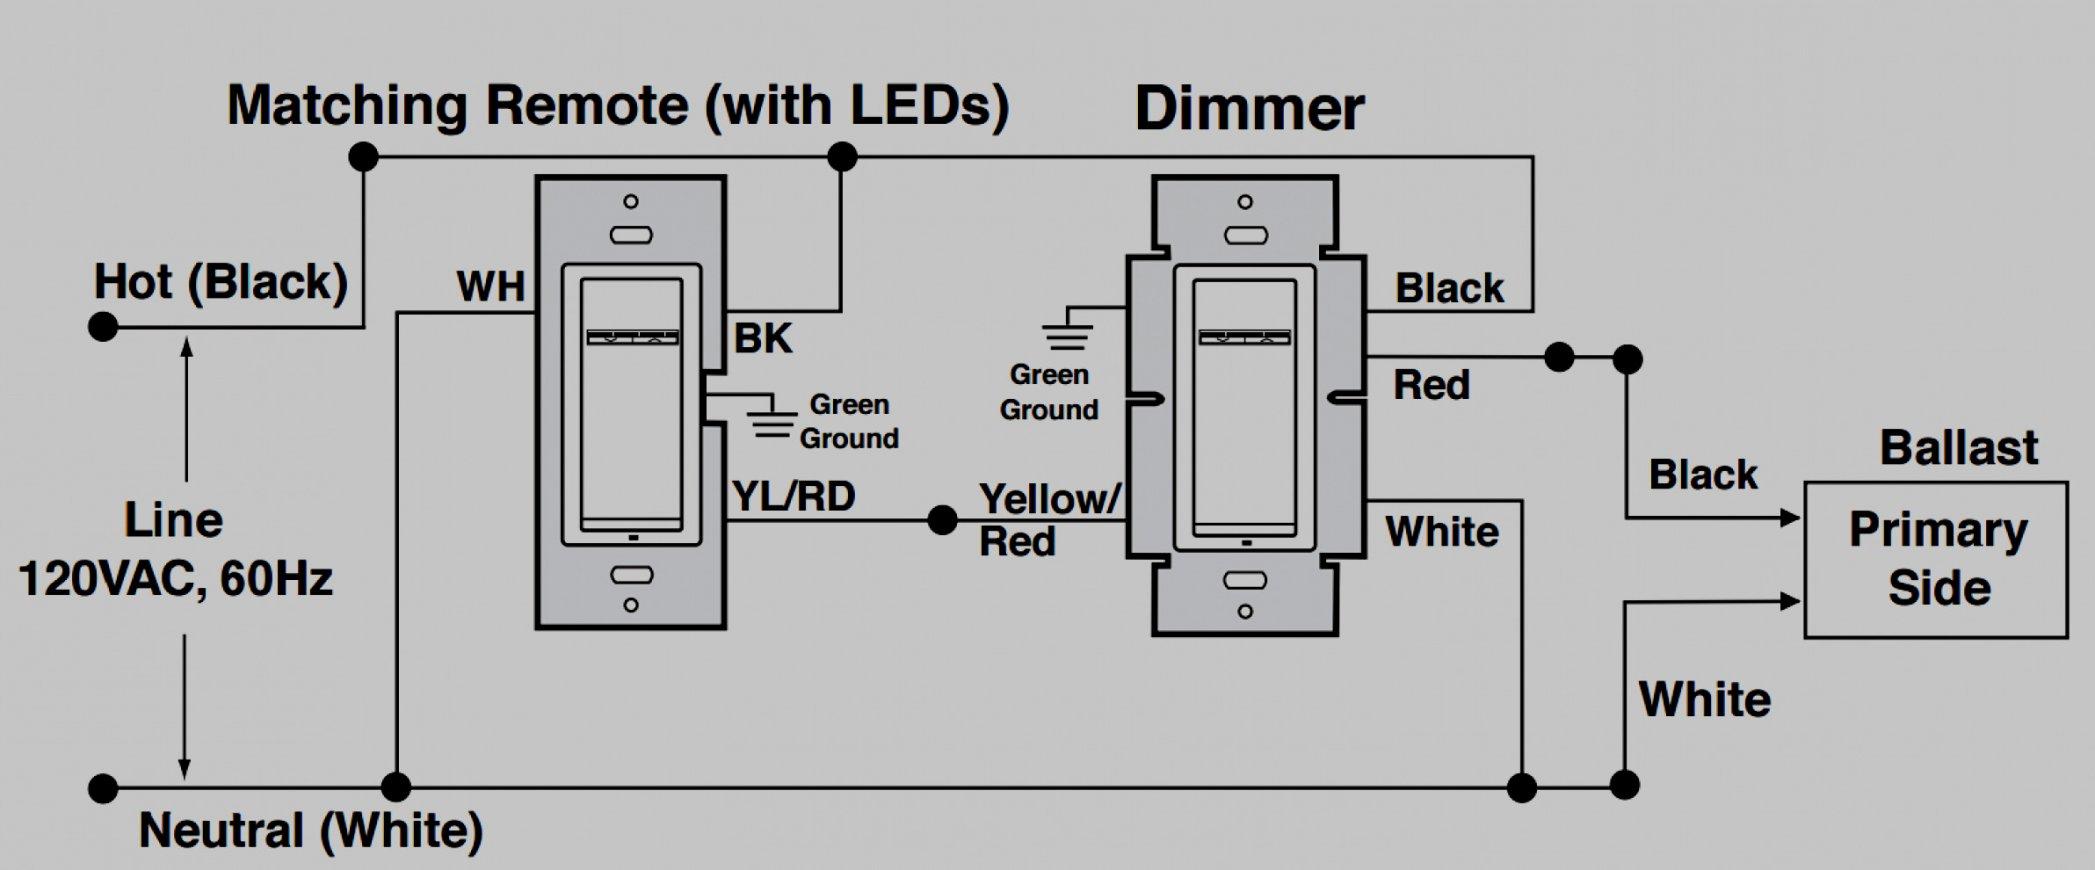 Dimmer Wiring Diagram | Wiring Diagram - Lutron Dimmer Wiring Diagram